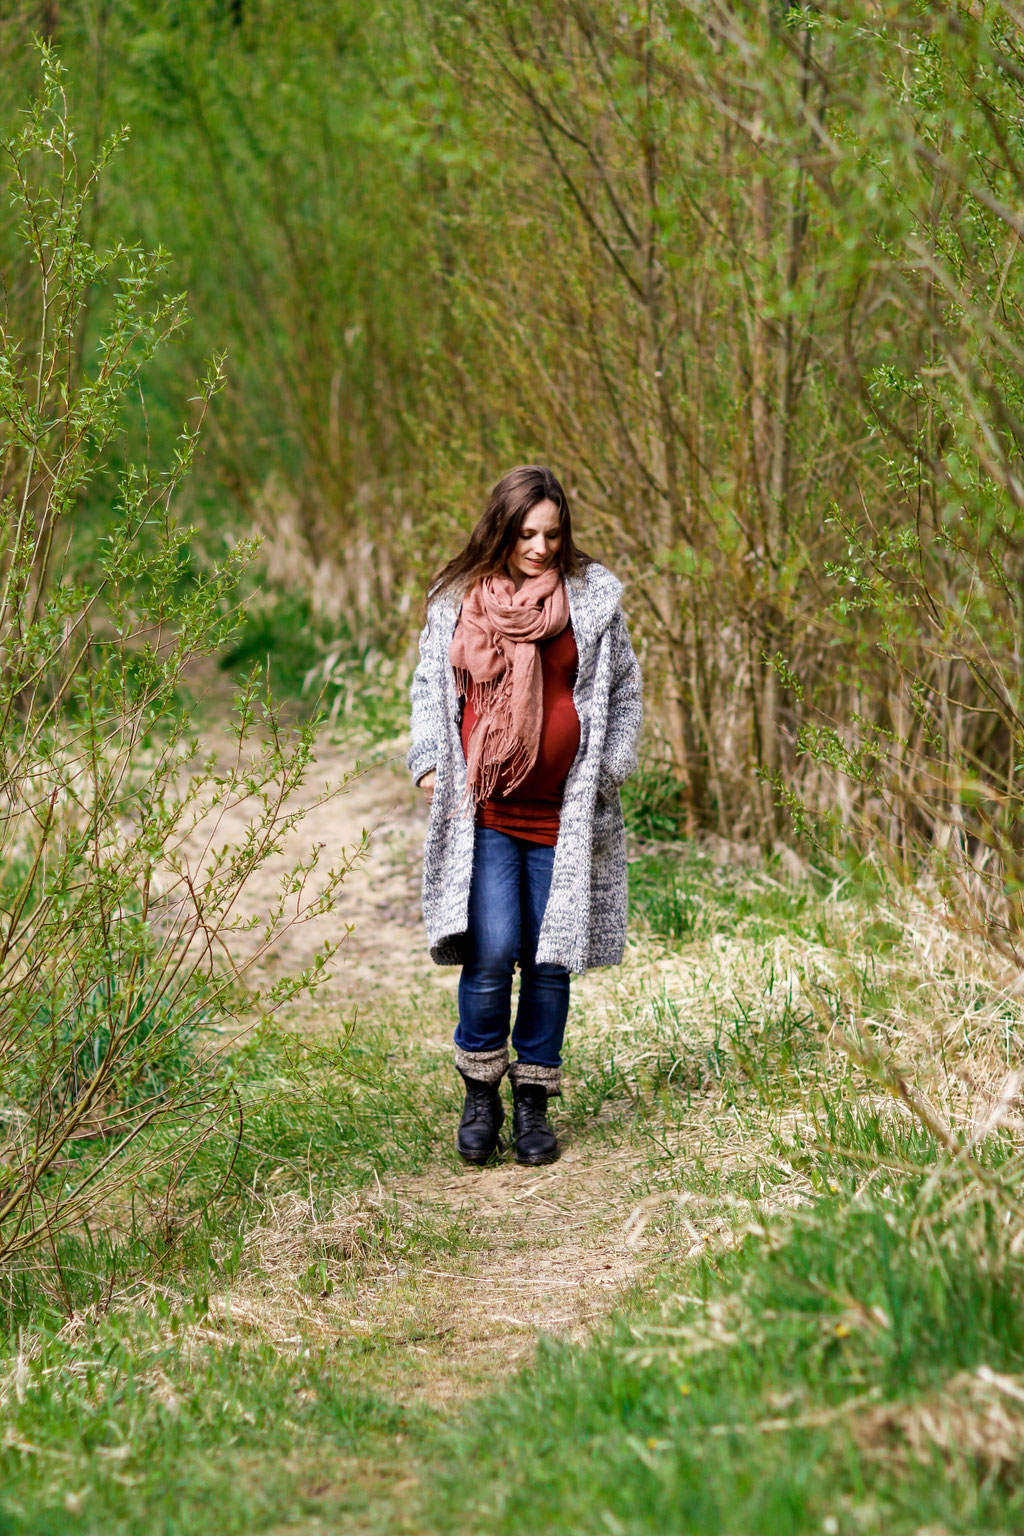 Schwangerschaftsshooting in Neubrandenburg mit Jenny, Christopher & Carl| Wald| Baum| Natur| Weg| Blumen| rot| schwanger| Familie| Greifswald| Hendrikje Richert Fotografie